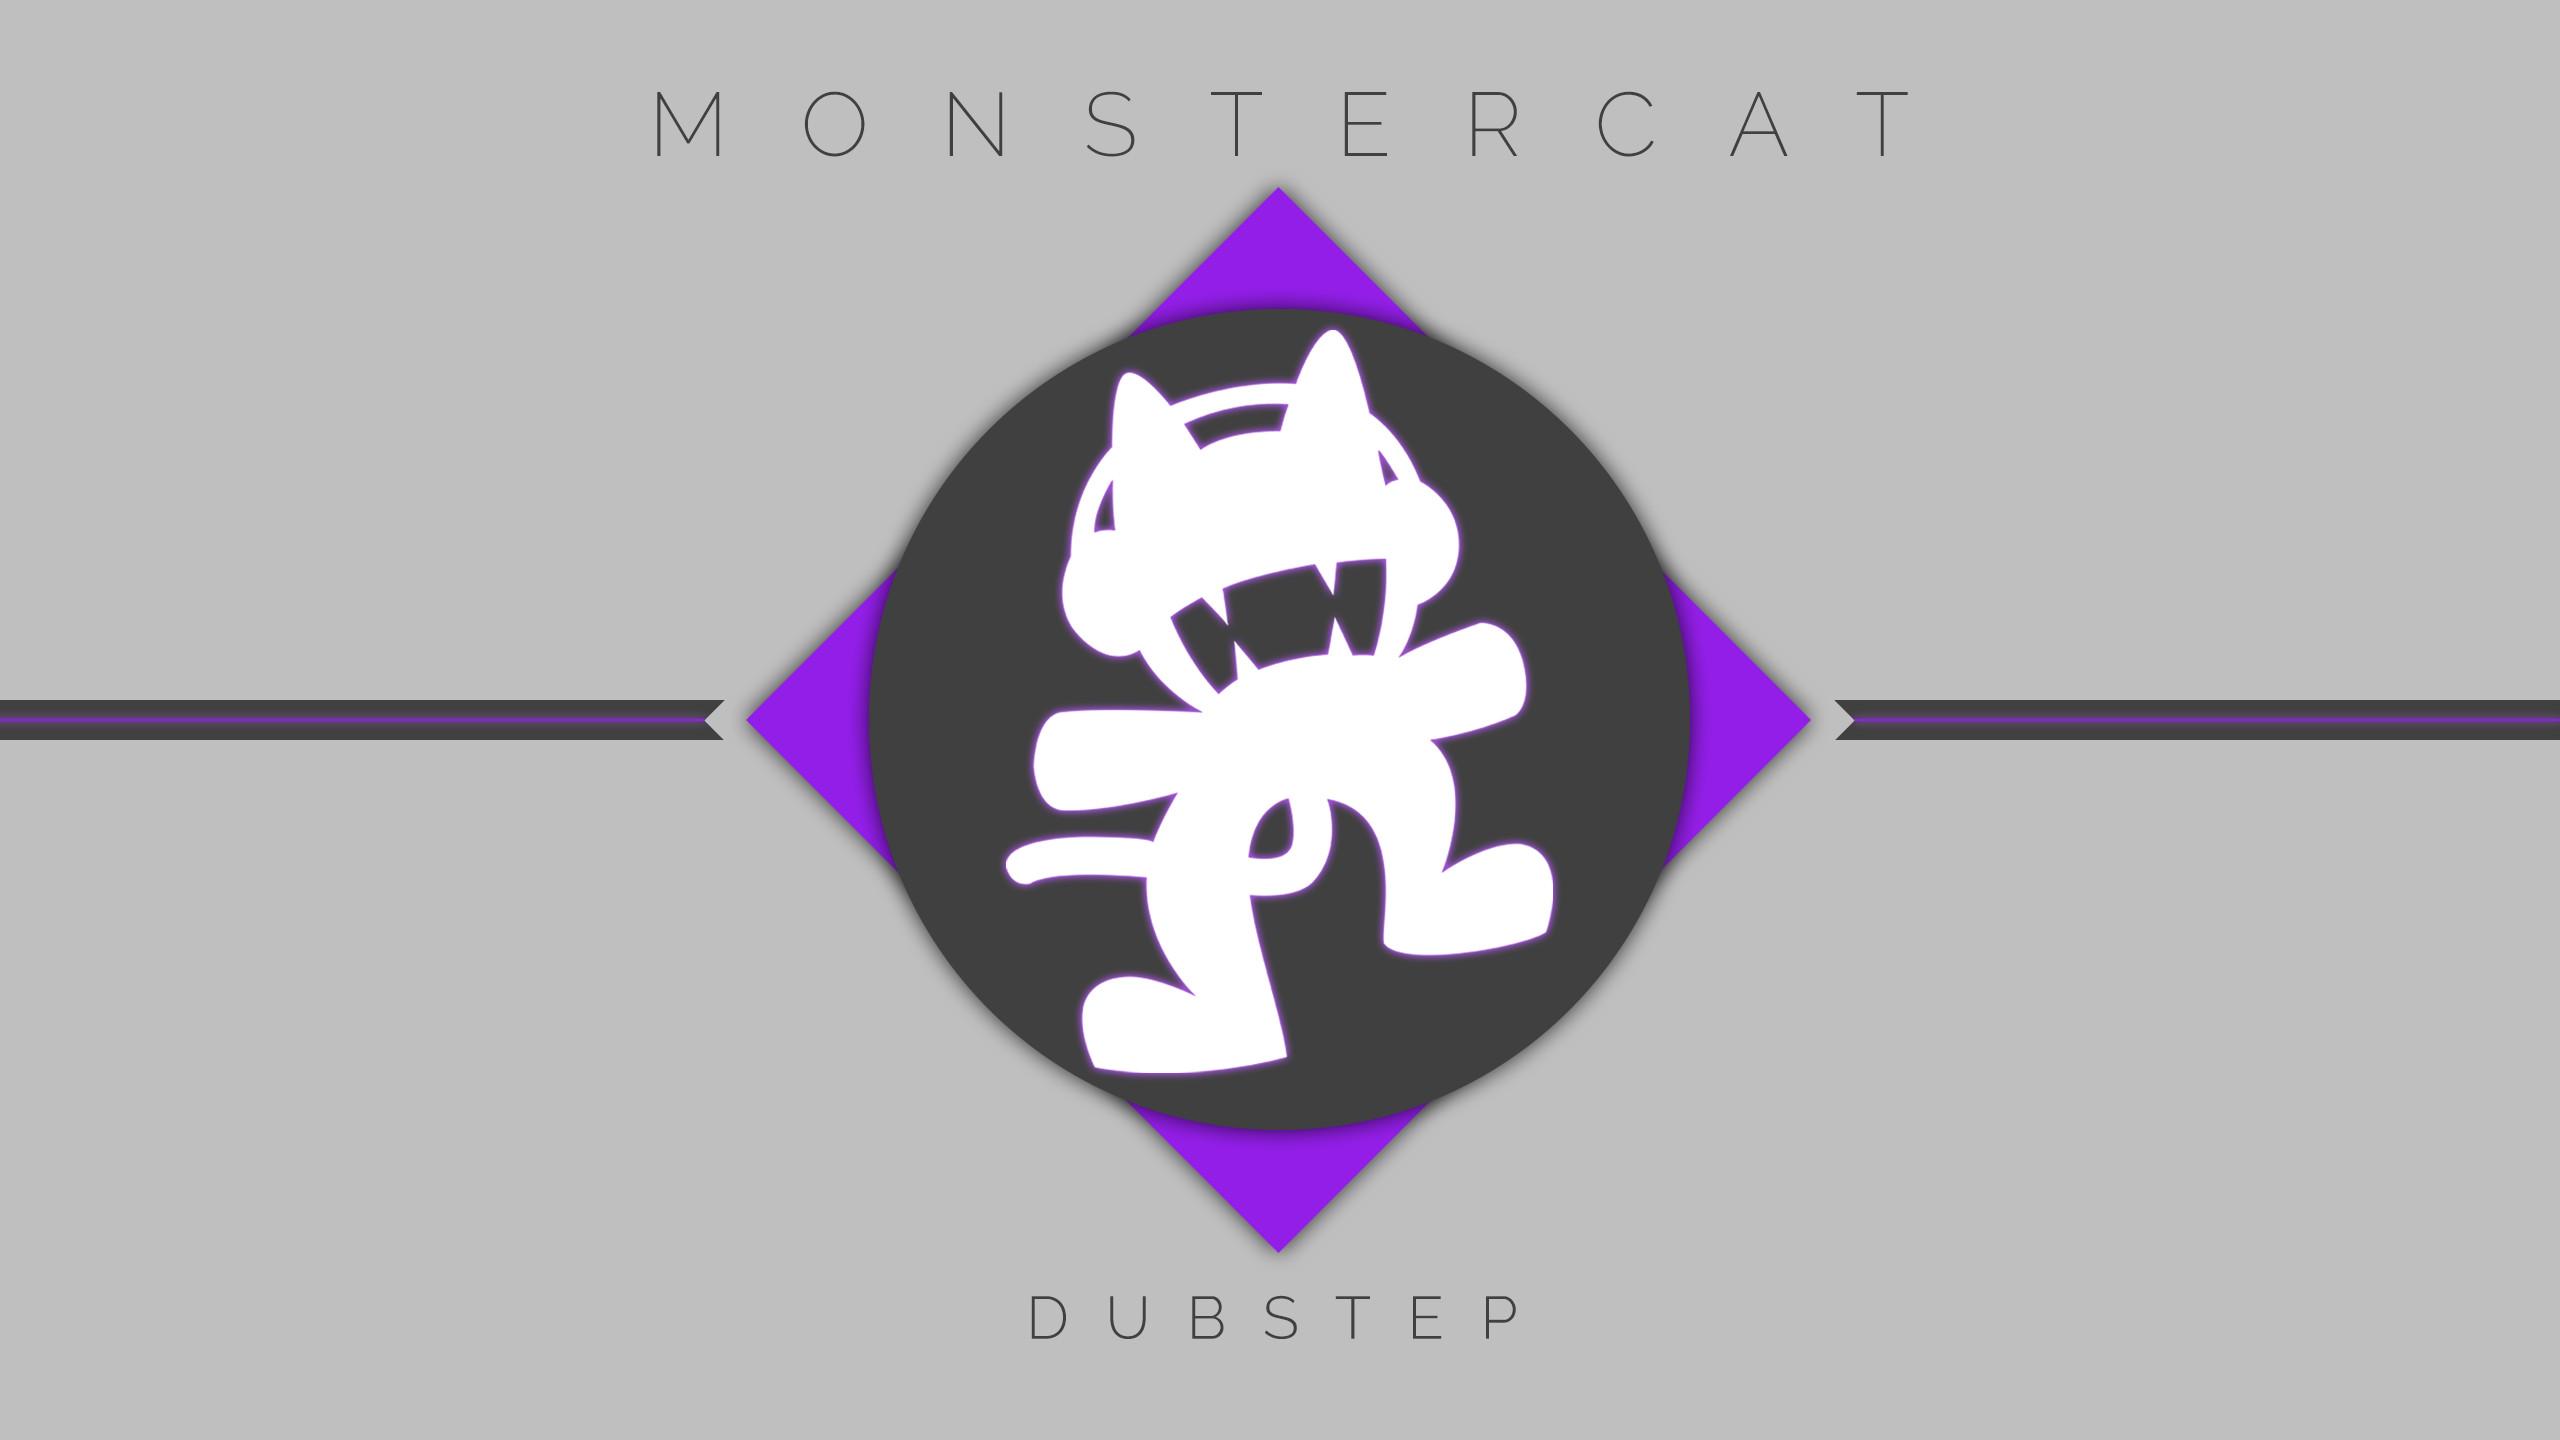 Monstercat – Dubstep [Genre] by nerdkid56.deviantart.com on @DeviantArt